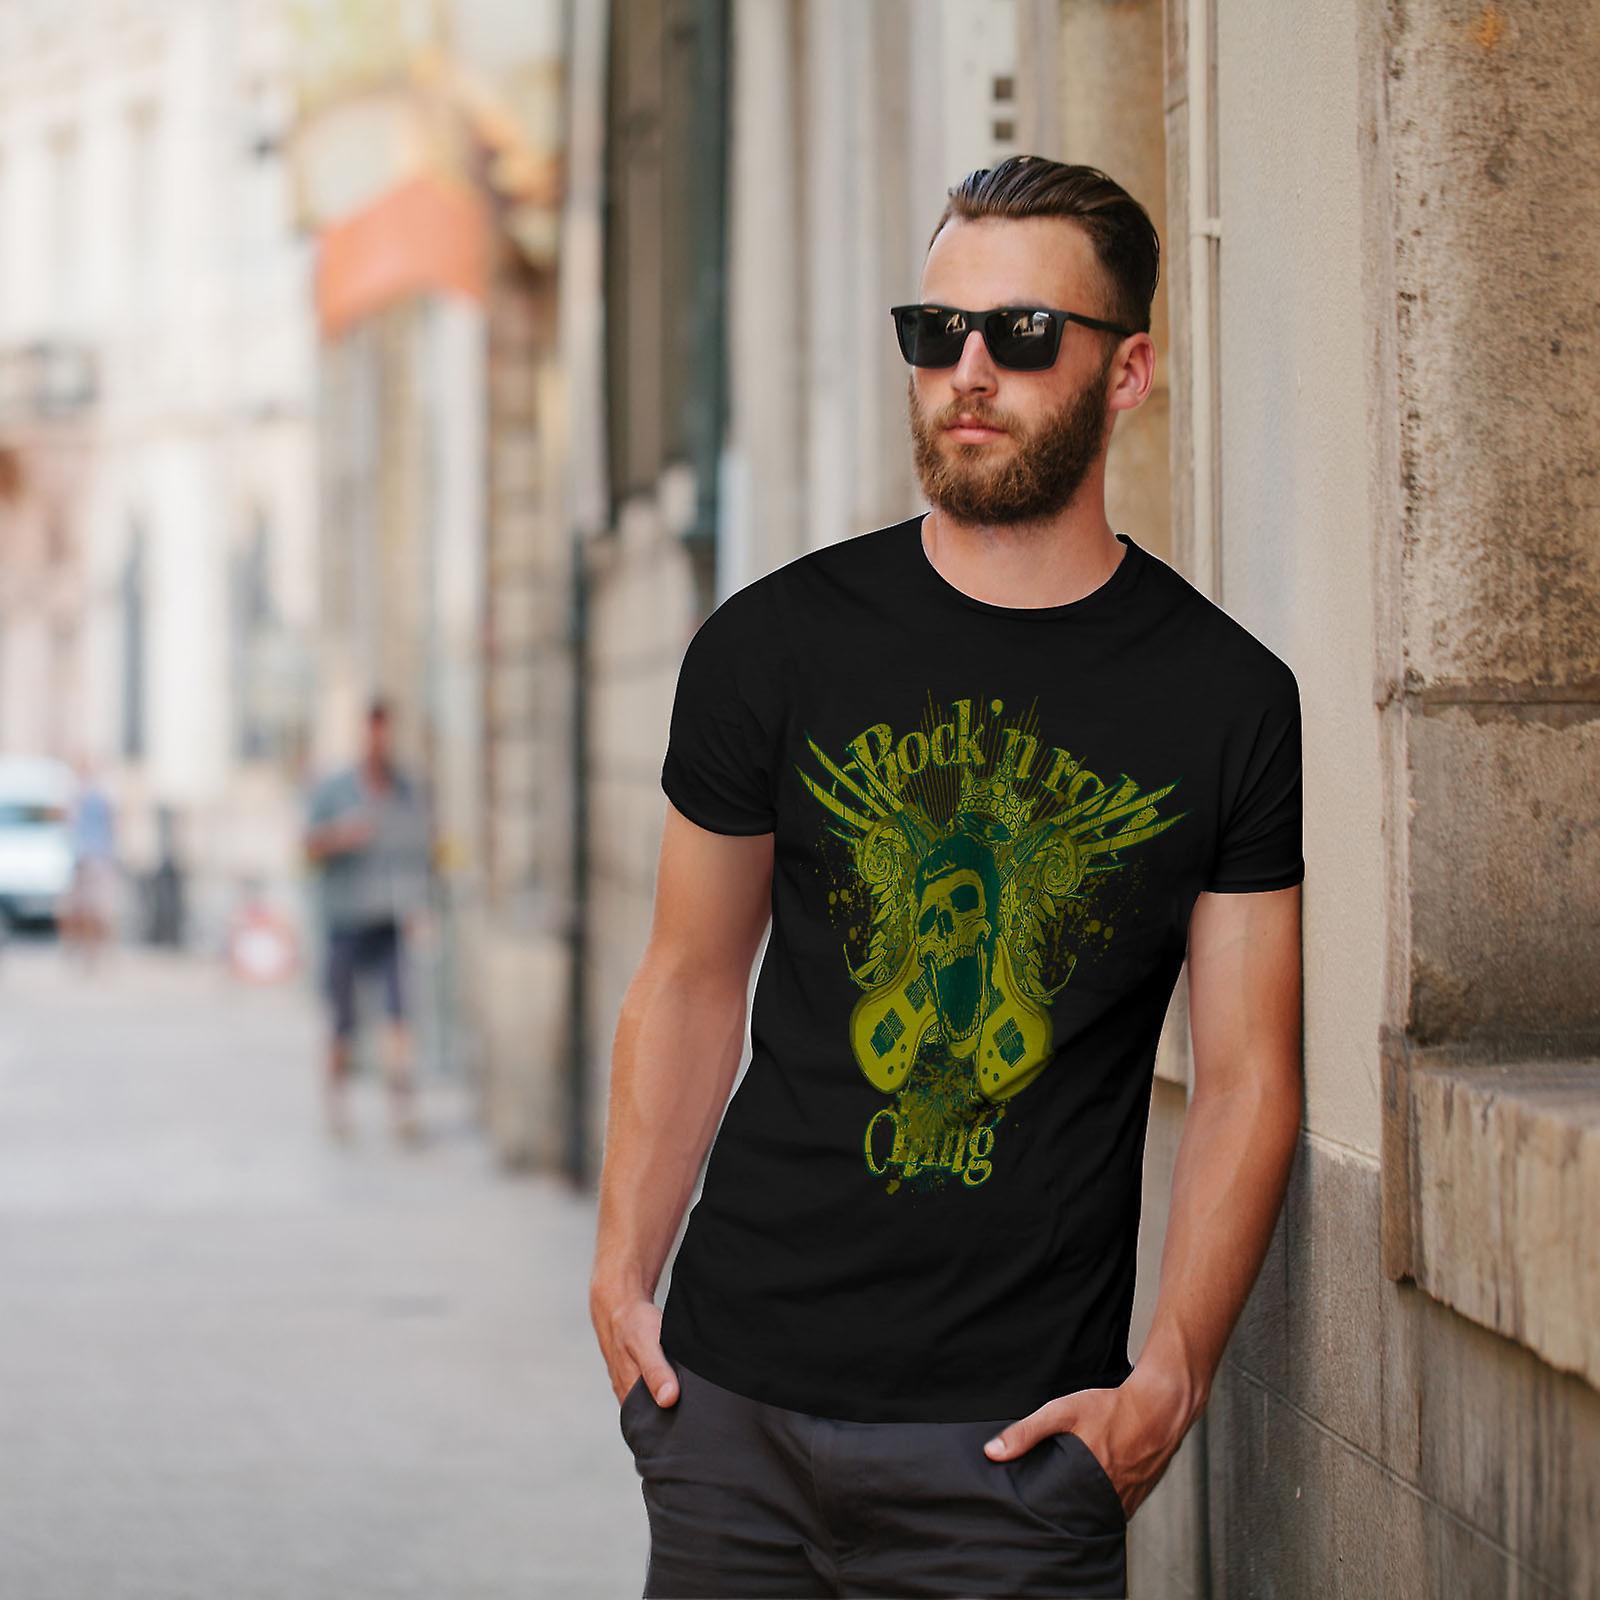 Rock N Roll Gang Music Men Black T-shirt | Wellcoda